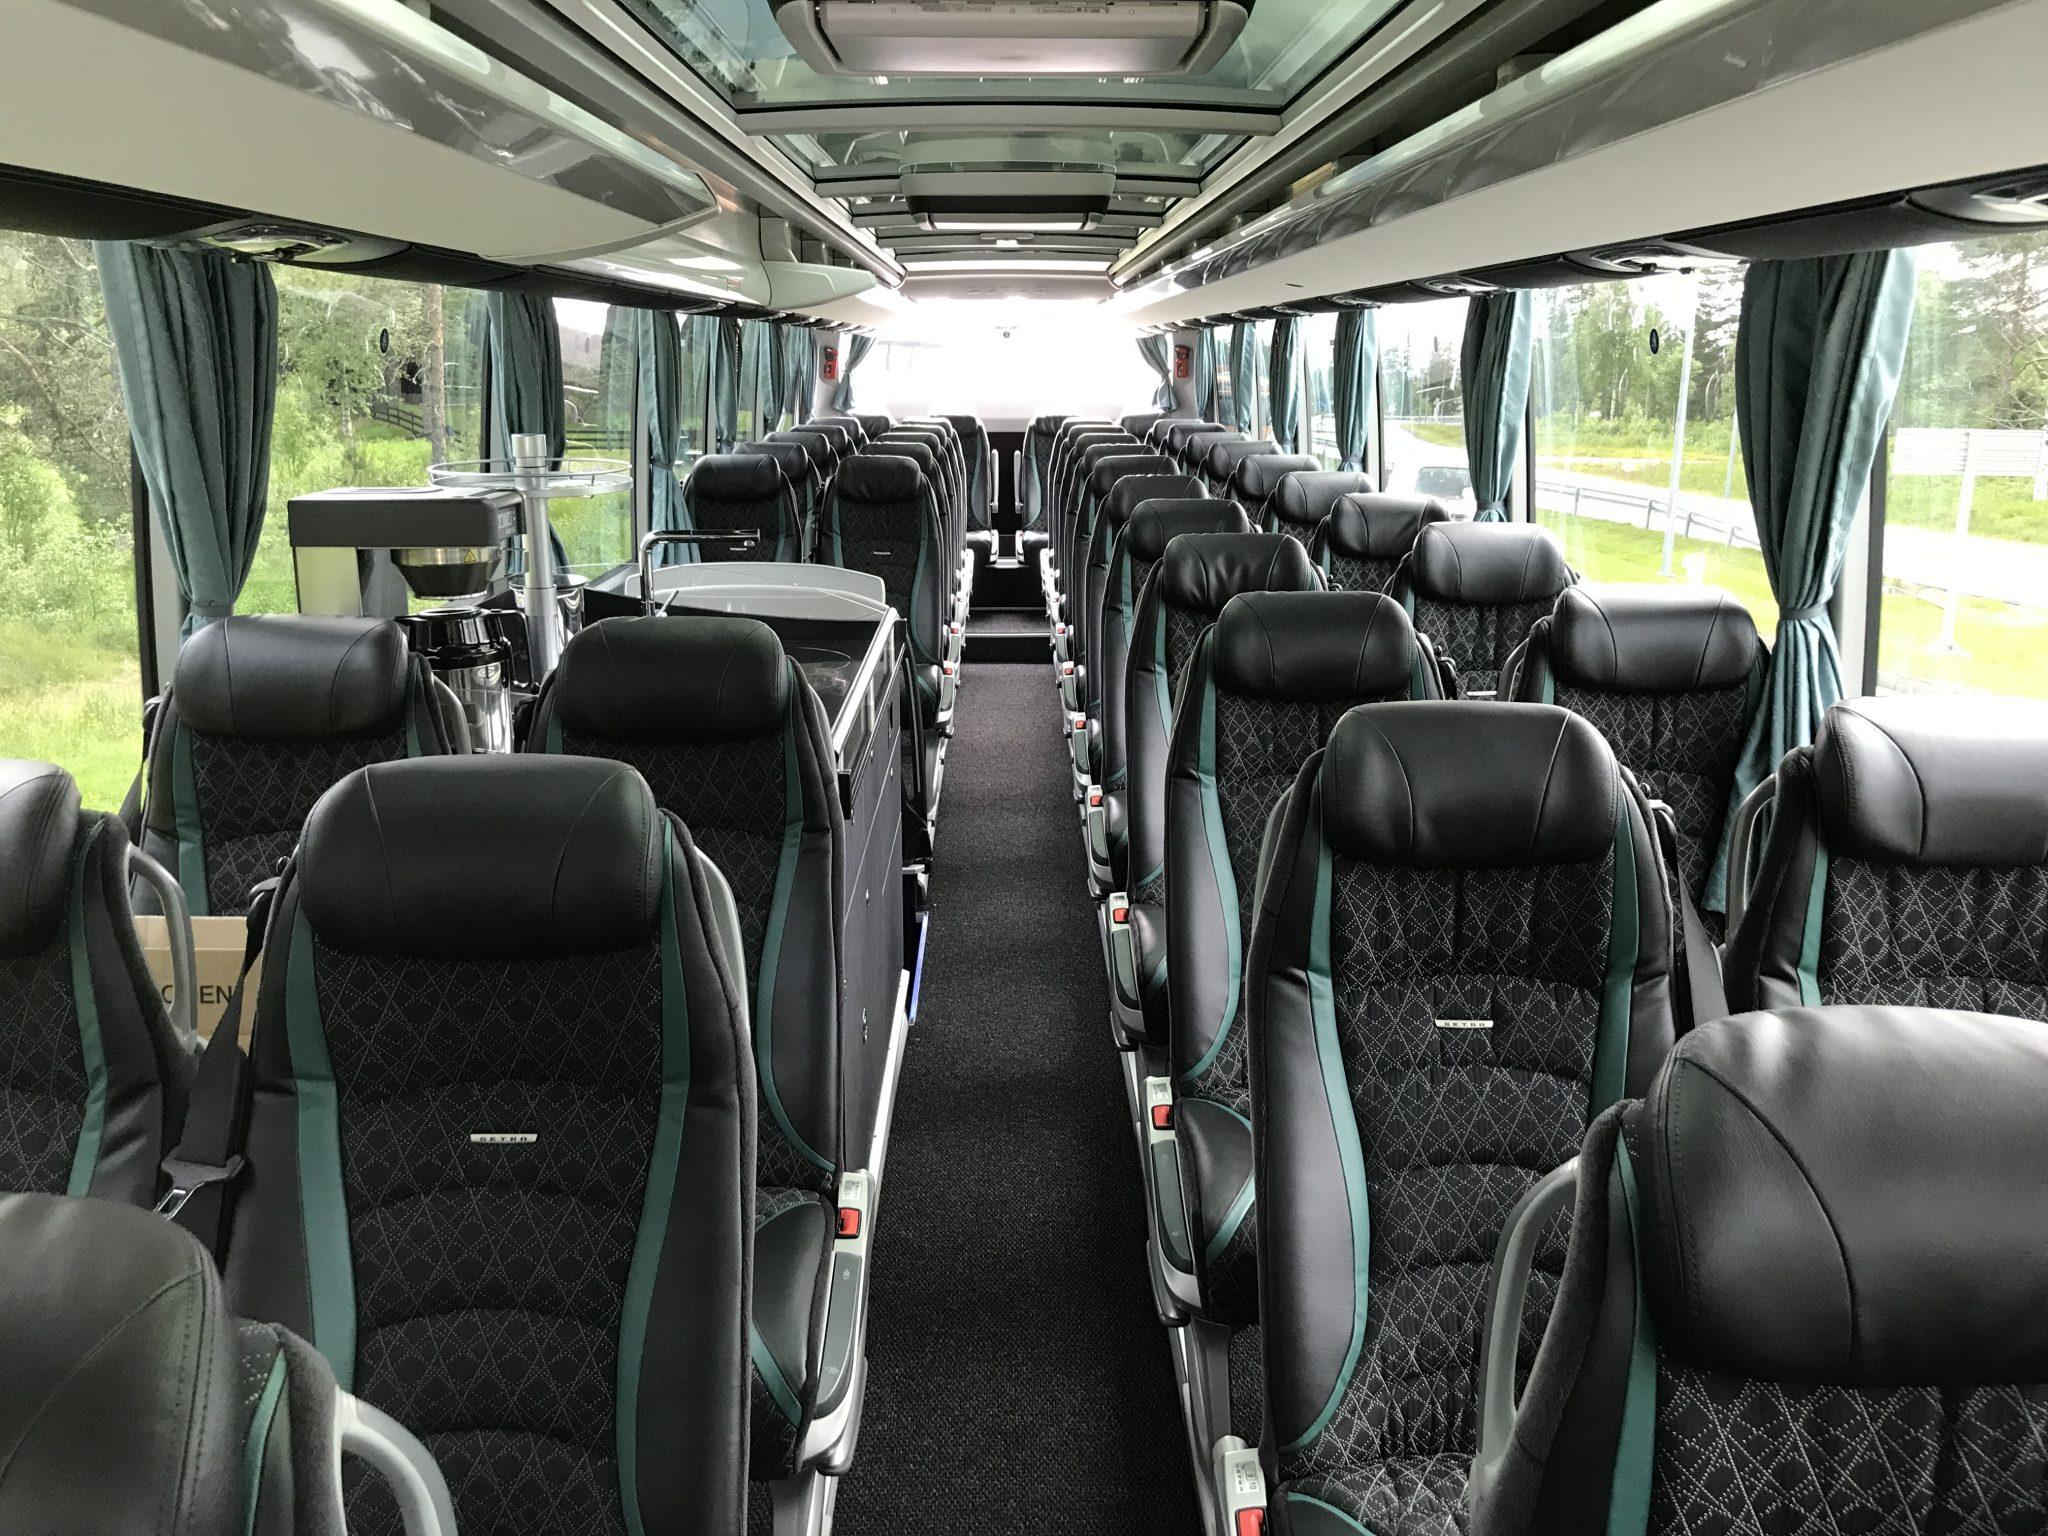 Handletur til Sverige Thorleifs bussreiser